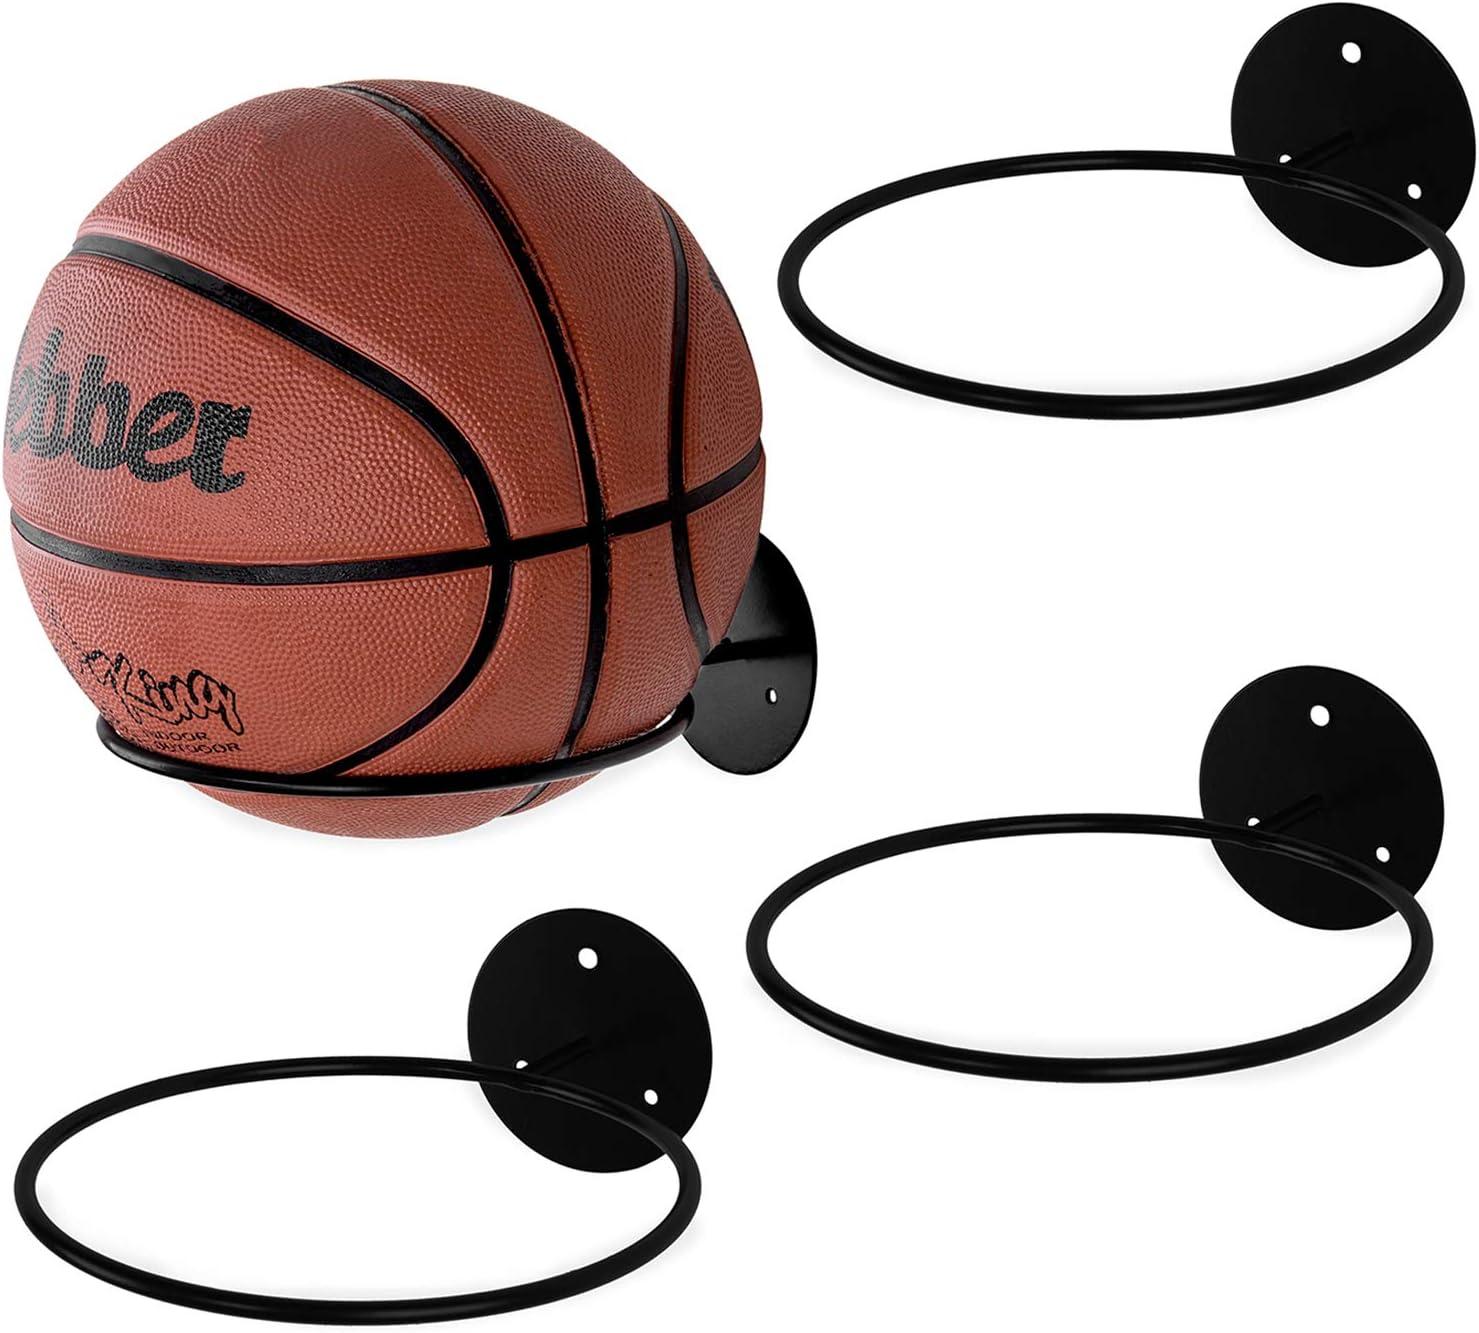 MyGift Set of 4 Black Metal Wall-Mounted Sports Ball Holder Display Rack